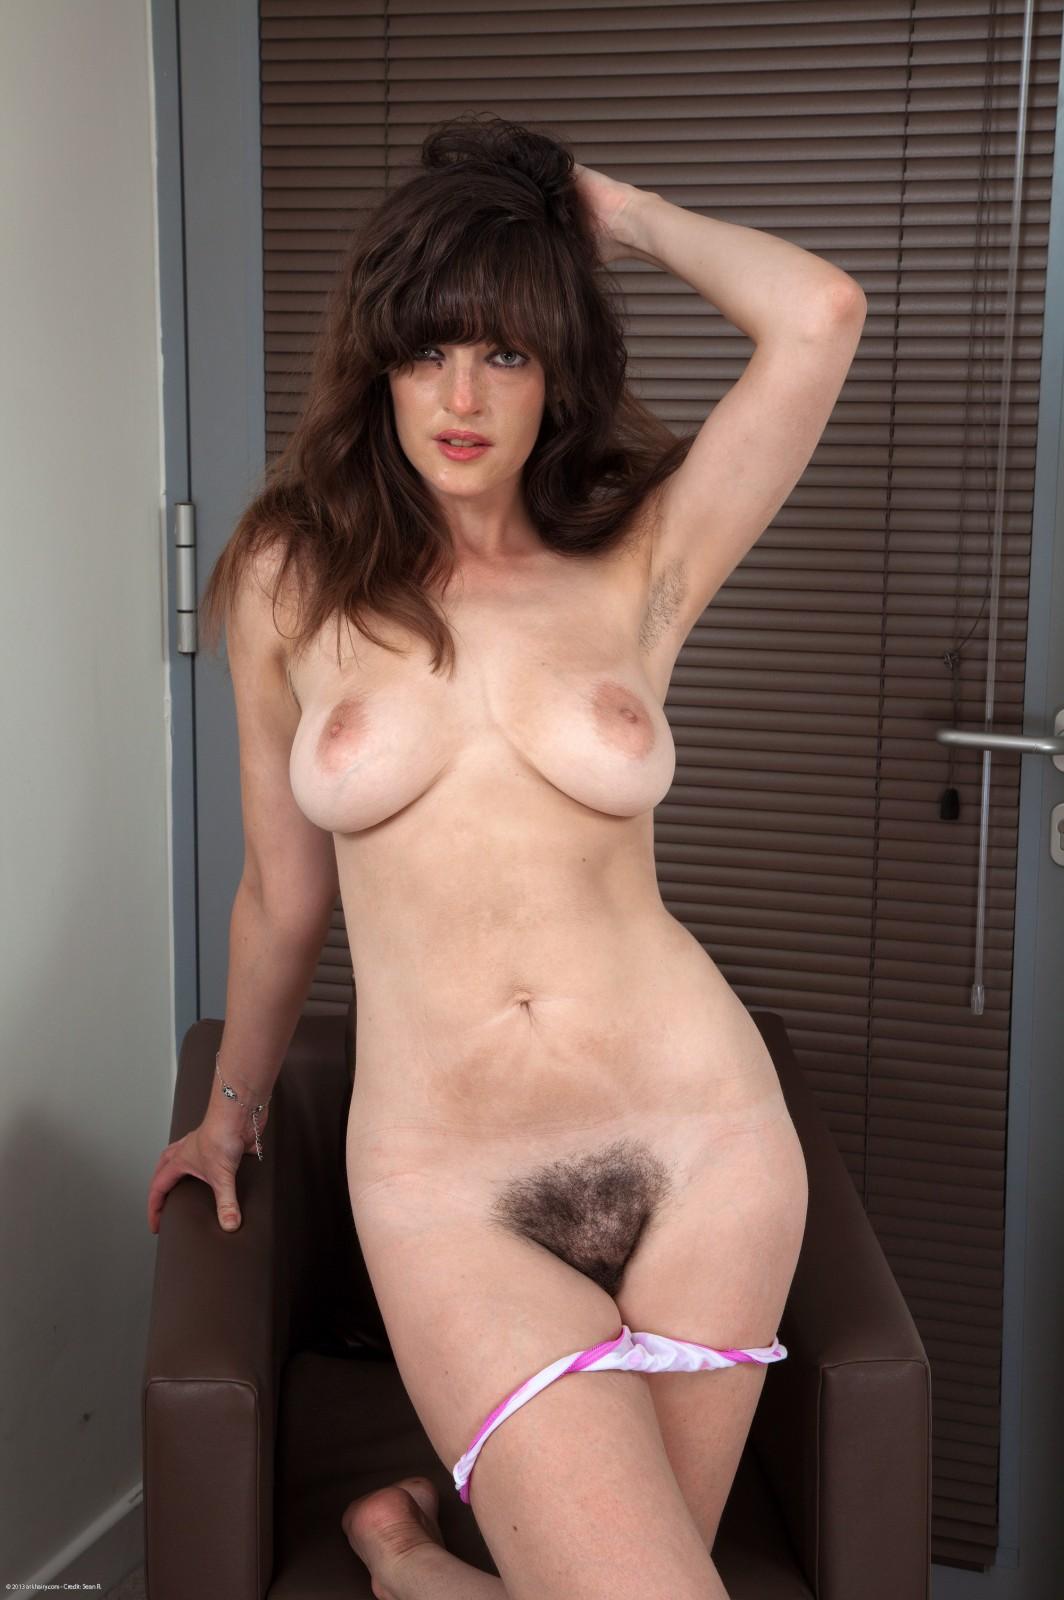 Amateur Busty Nude Babes